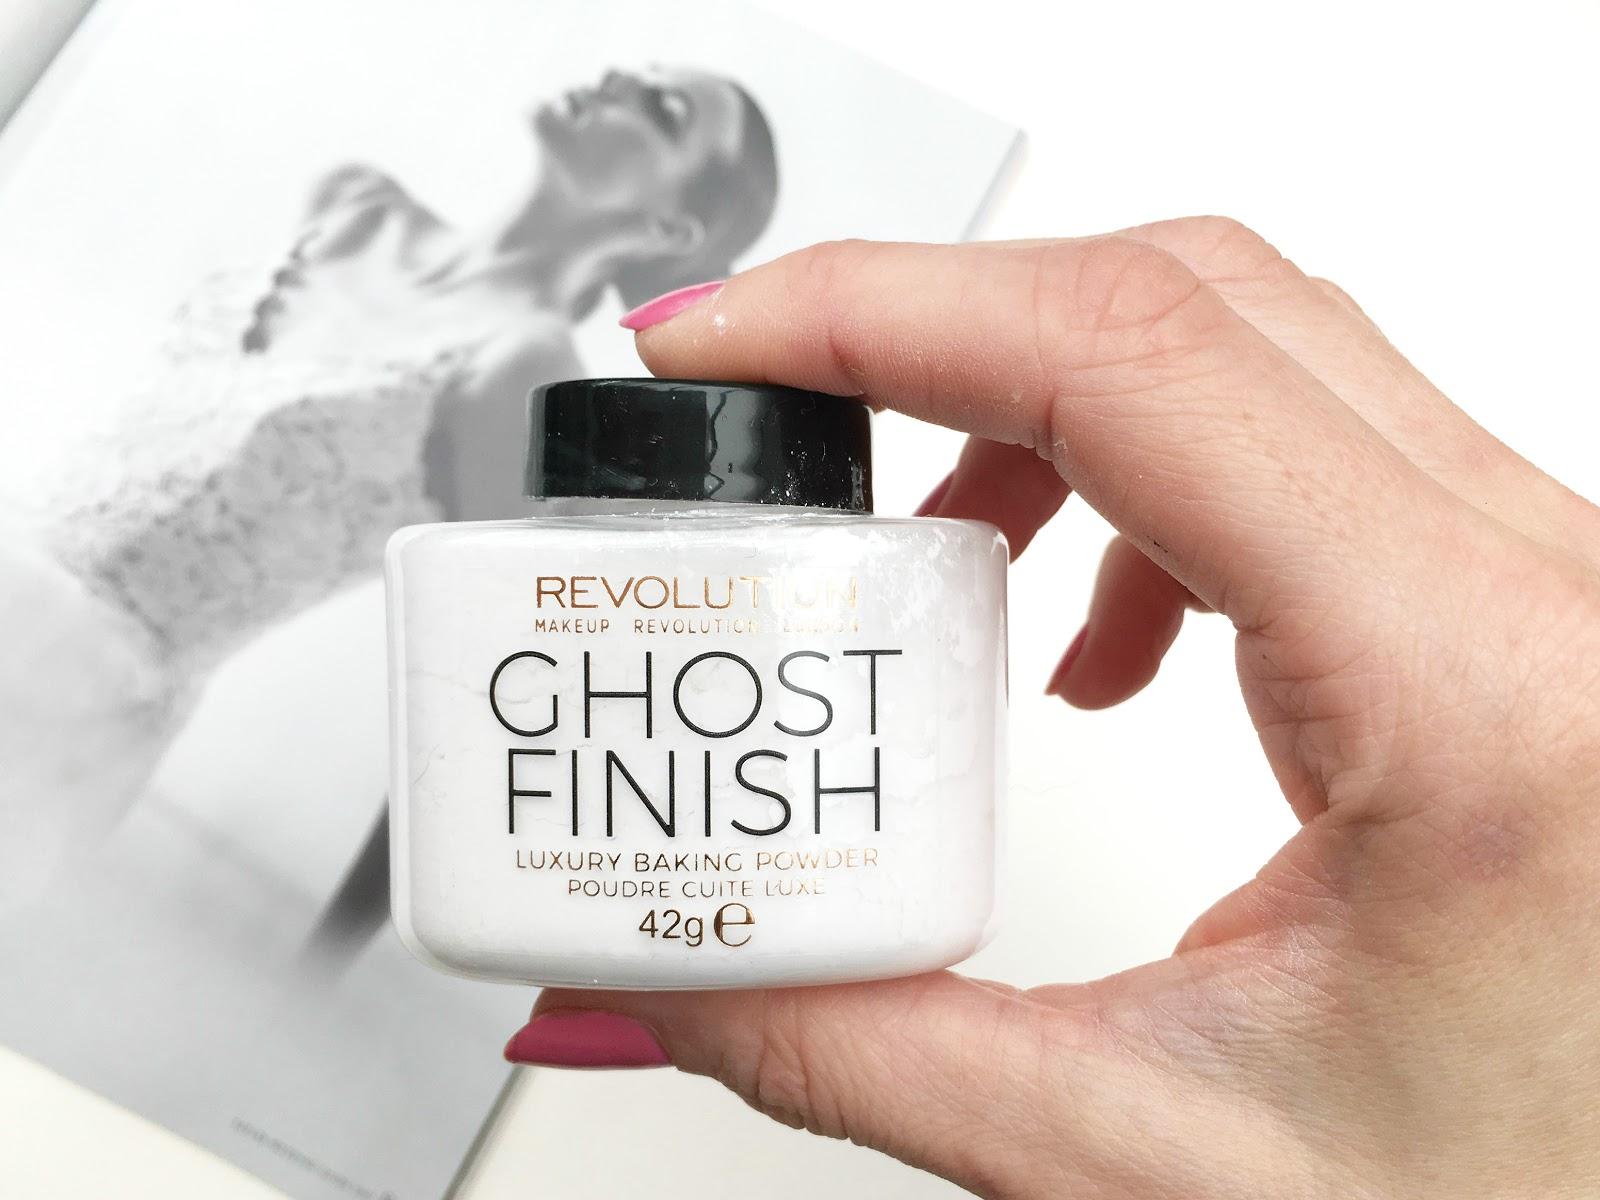 Makeup Revolution Baking Powder Ghost Finish, Makeup Revolution Baking Powder Ghost Finish review, Makeup